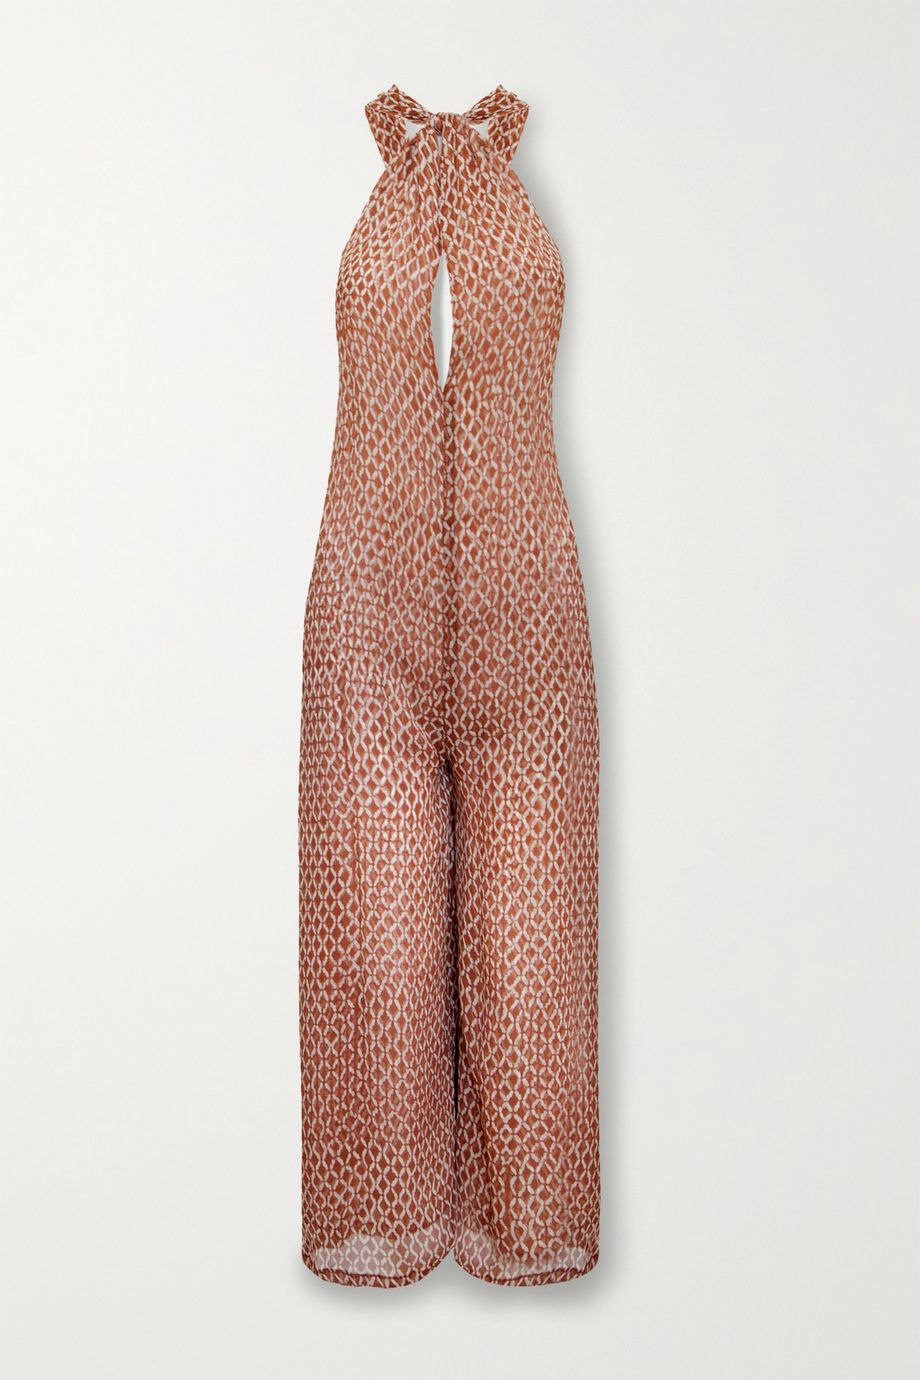 Cloe Cassandro 【NET SUSTAIN】Ruby 分层式印花真丝挂脖连身裤